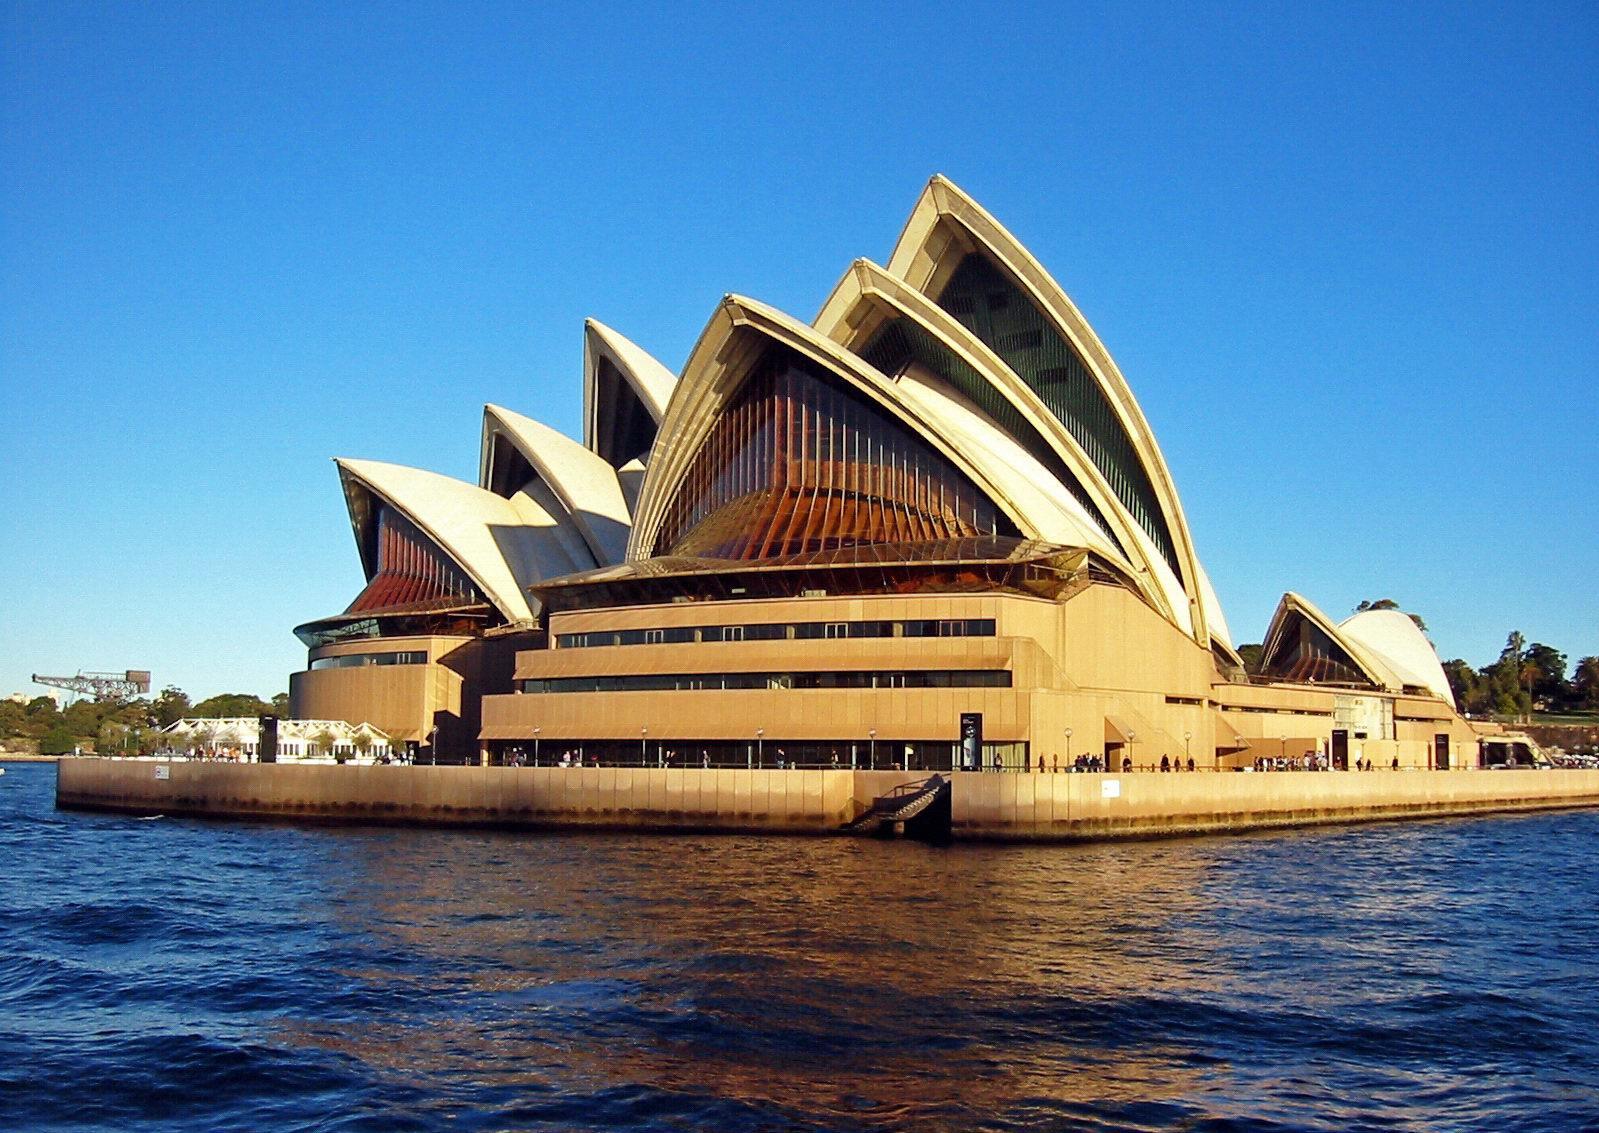 http://2.bp.blogspot.com/_mGkoANc7fi0/TUcXmTJDedI/AAAAAAAACAc/1TYwZ5LQWYg/s1600/Sydney_Opera_House_Australia.jpg